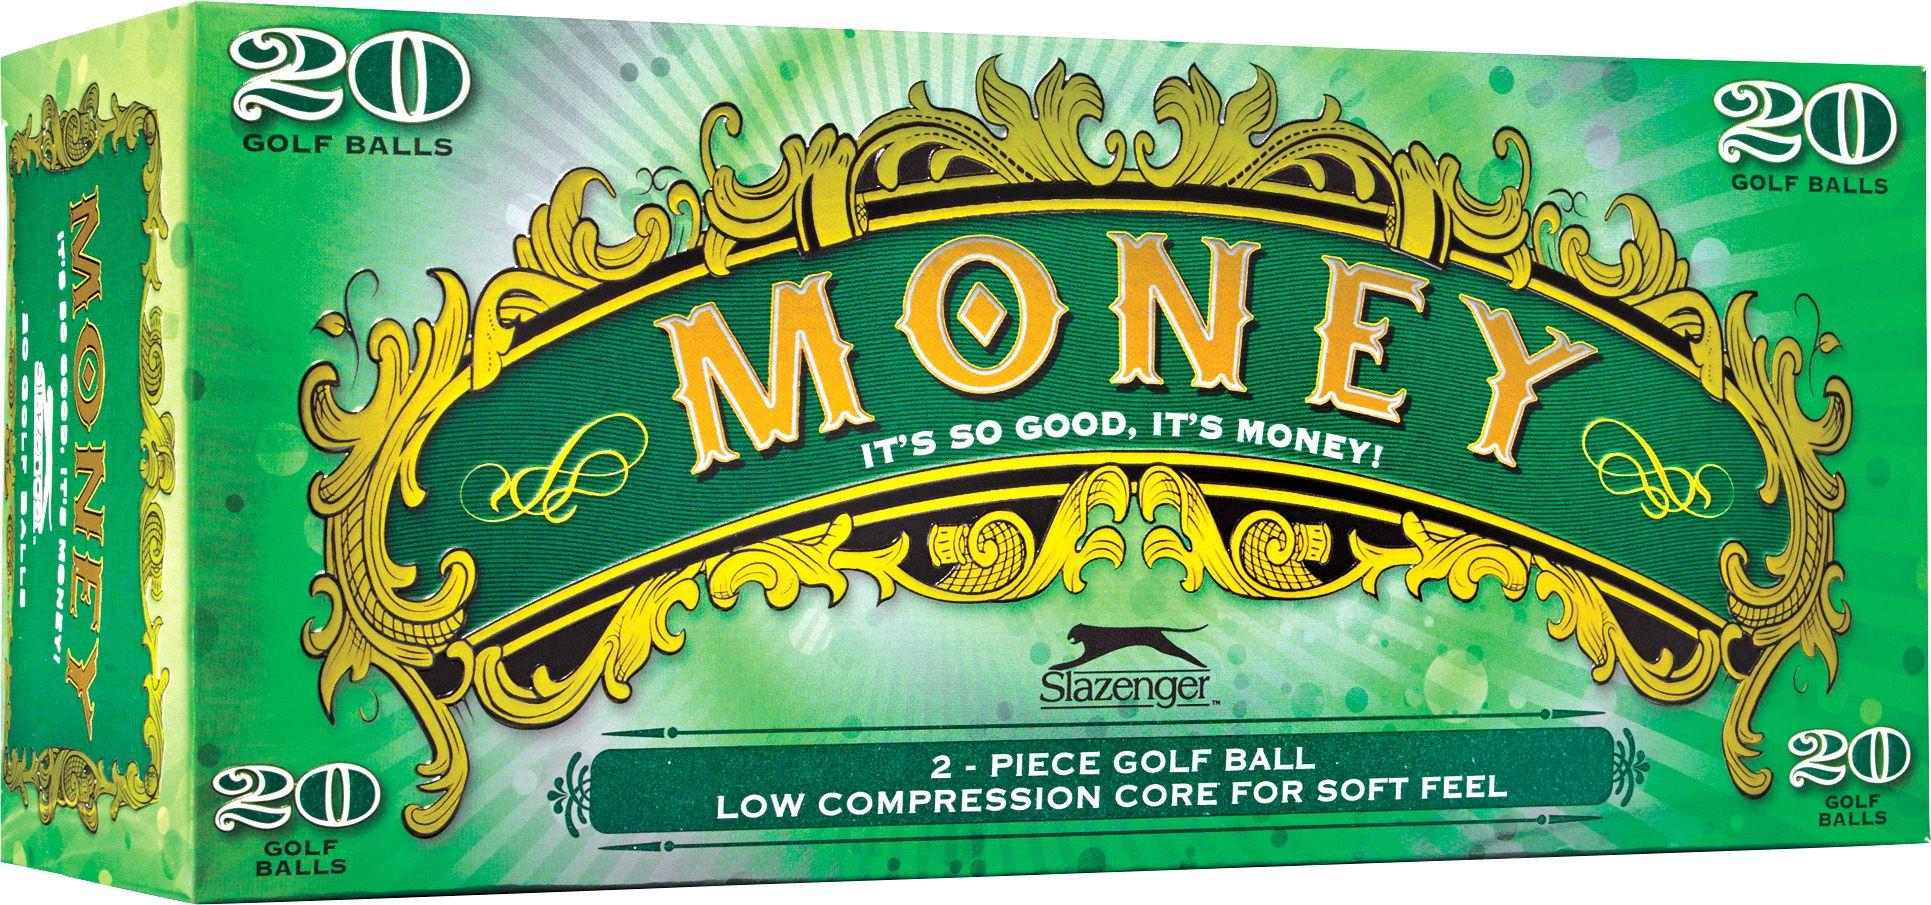 slazenger money golf balls u2013 20 pack u0027s sporting goods